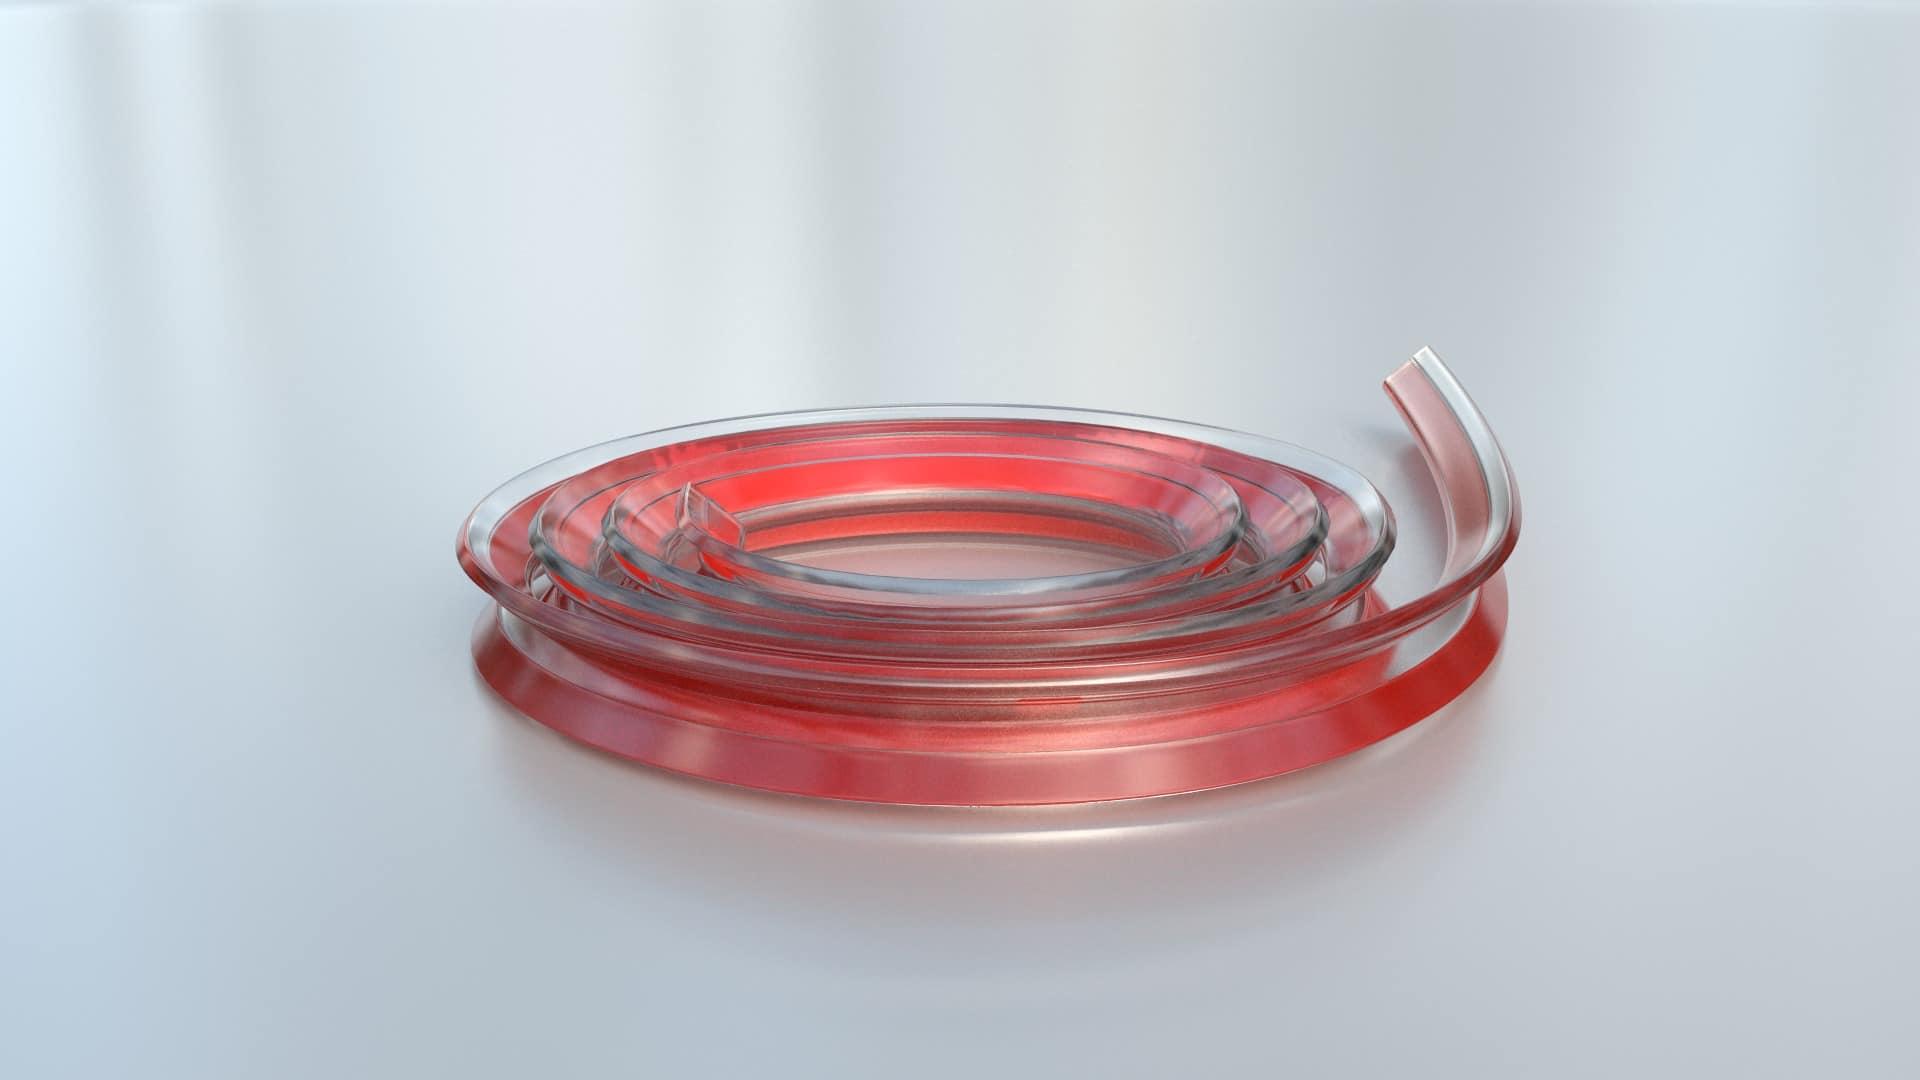 RV Undercarriage Sharp Edge Protector